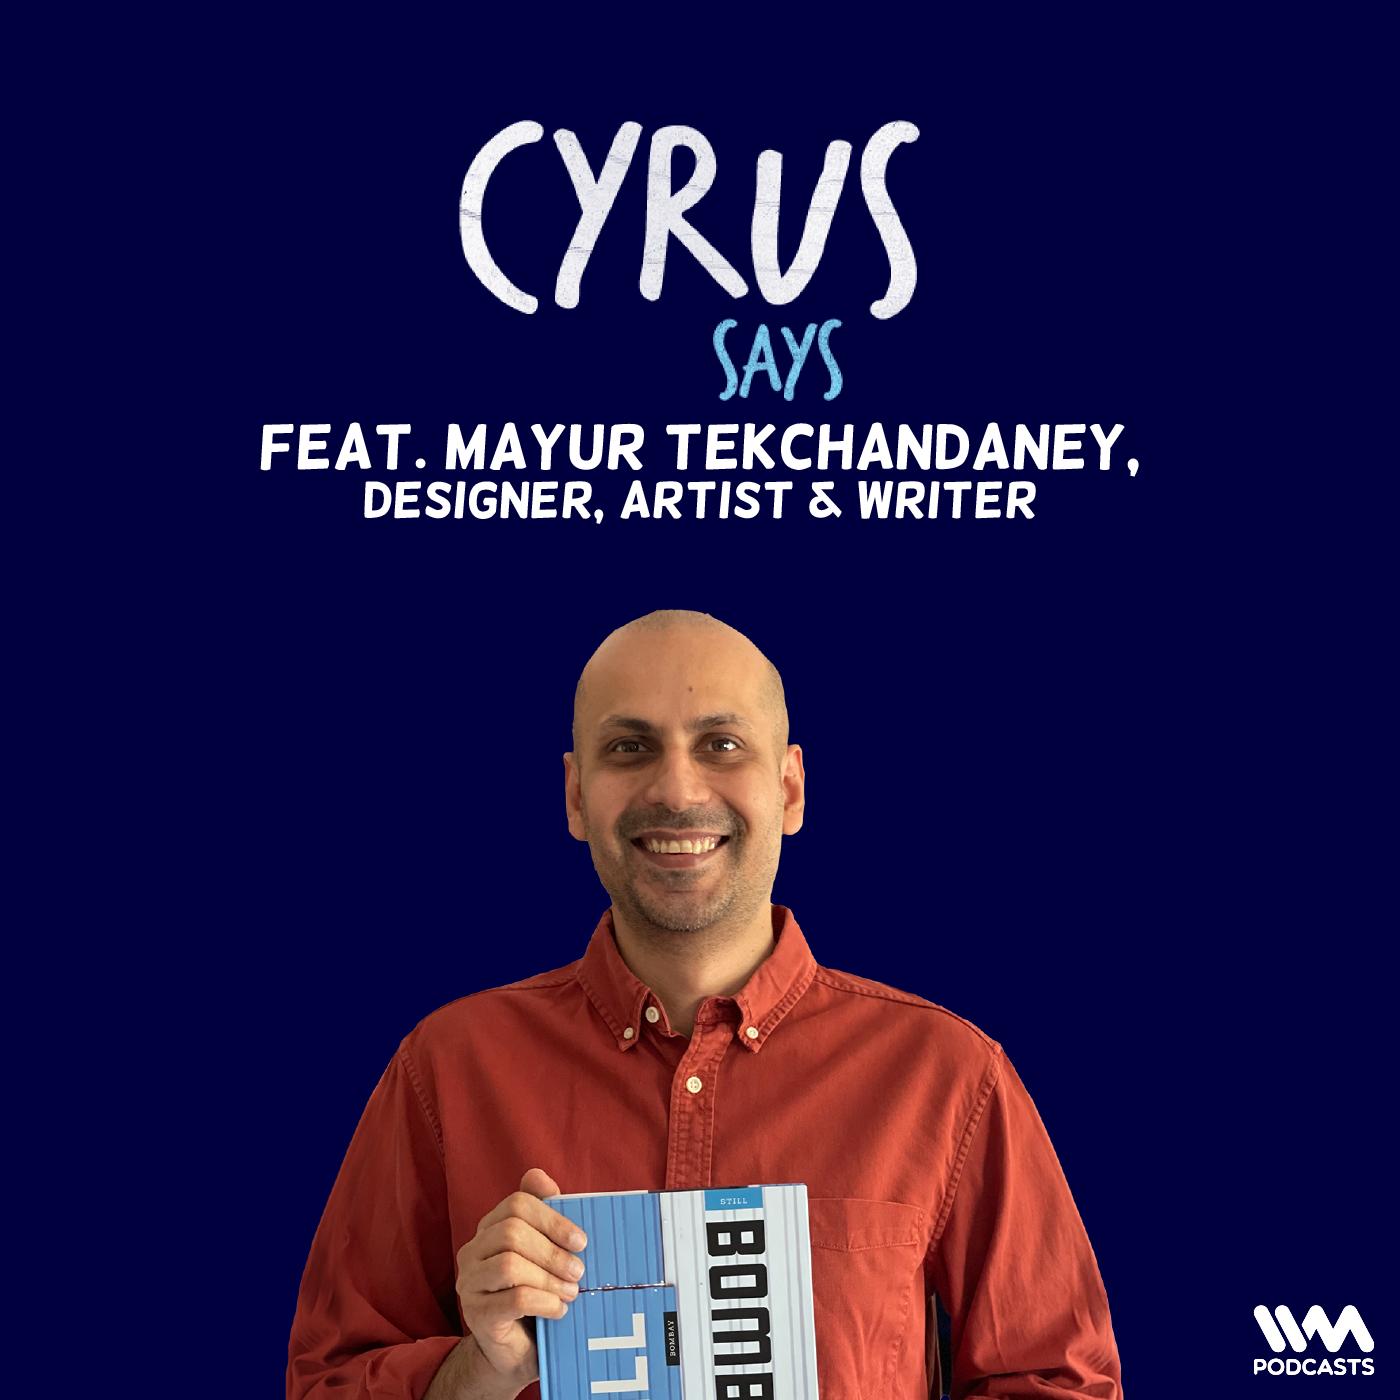 Ep. 680: feat. Mayur Tekchandaney